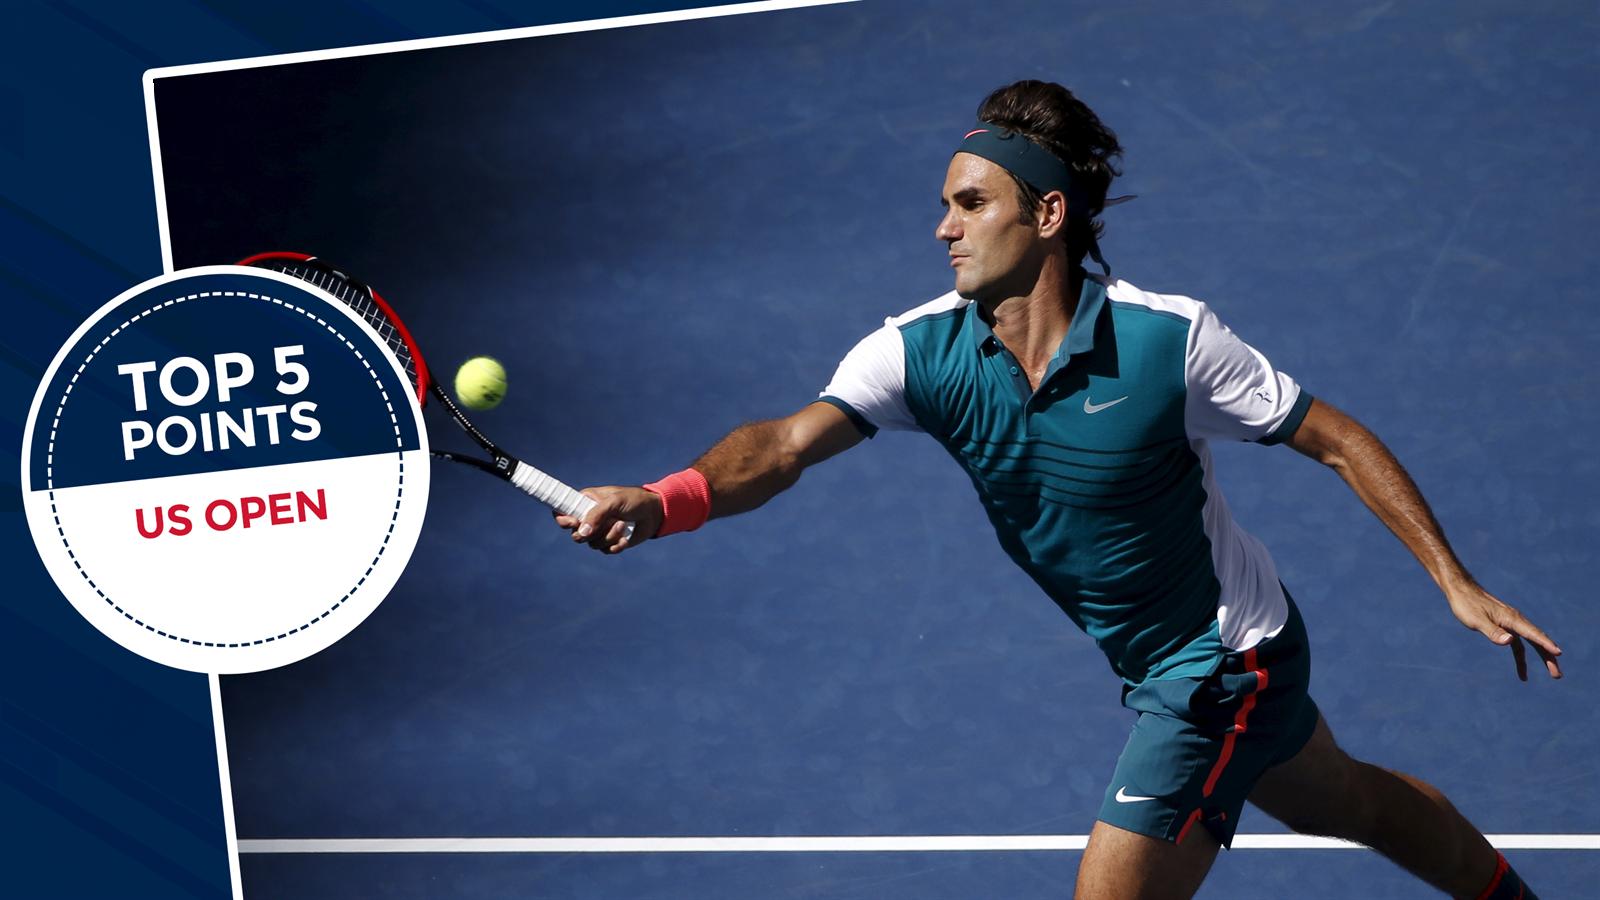 Formidable Federer & even Tomic applauds gutsy Gasquet - US Open 2015 - Top 5 points